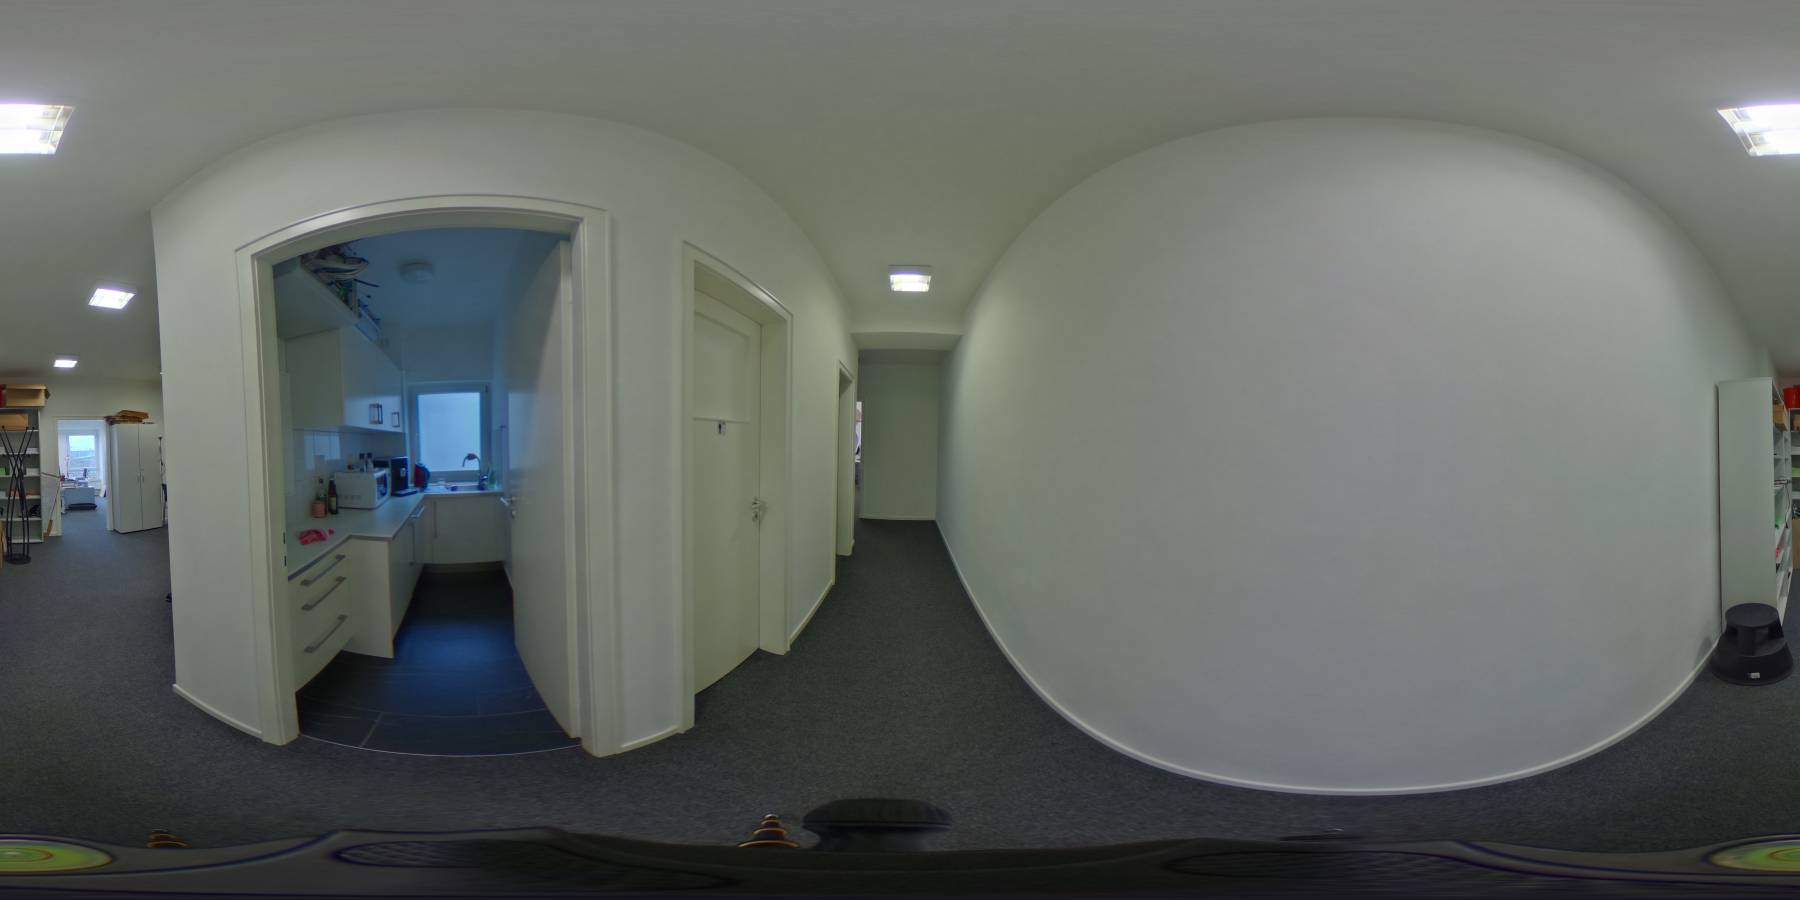 Wunderbar Deckenverkabelung Ideen - Der Schaltplan - greigo.com